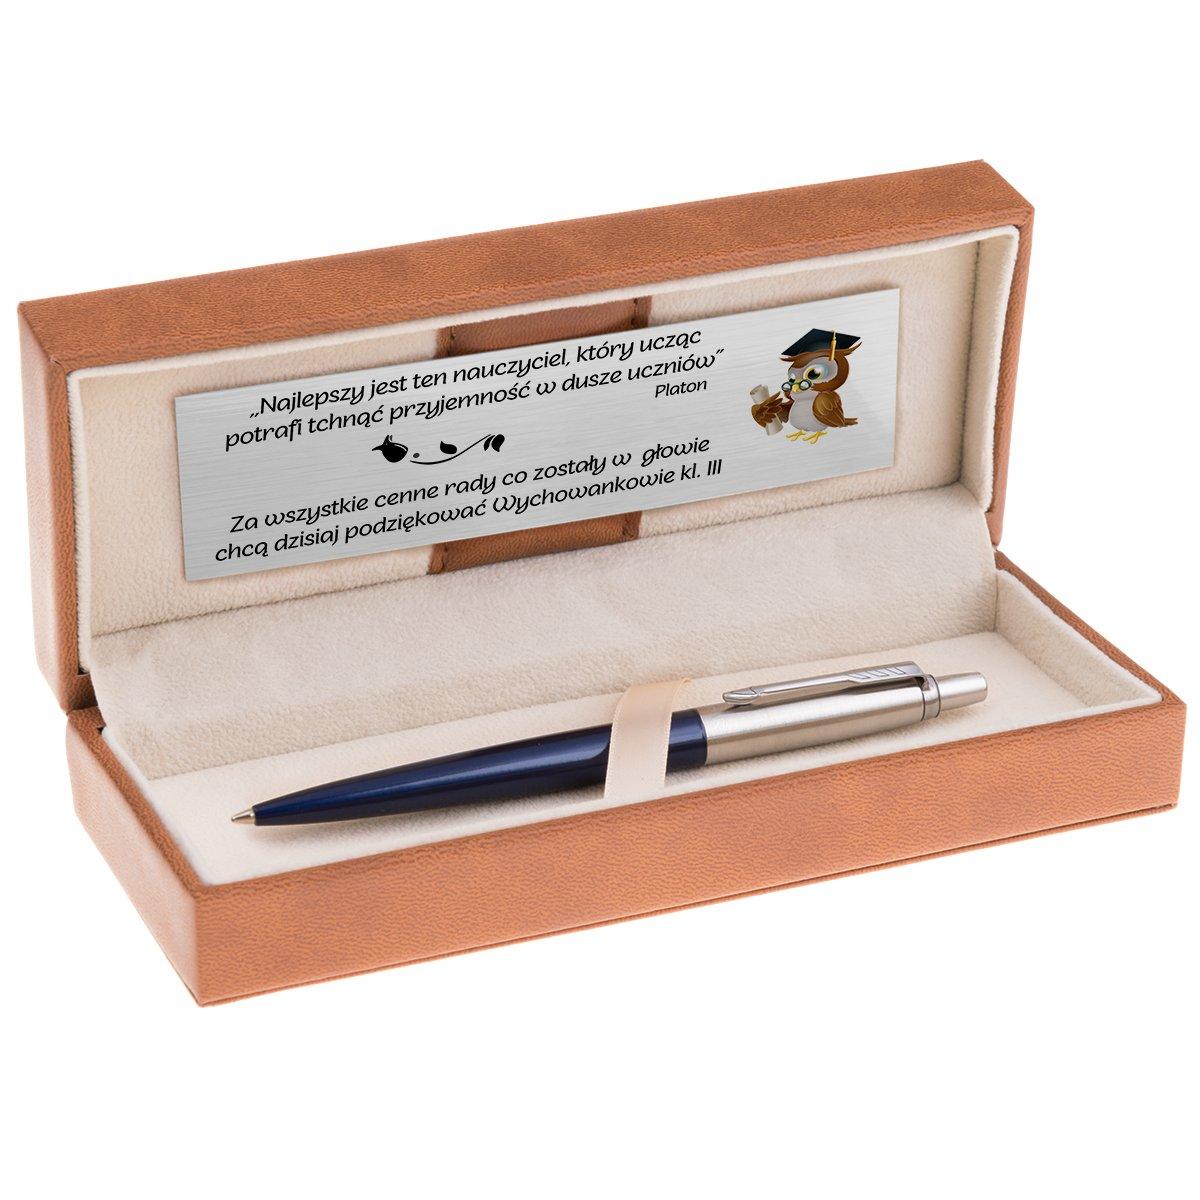 Długopis Parker Jotter CT Royal niebieski Grawer